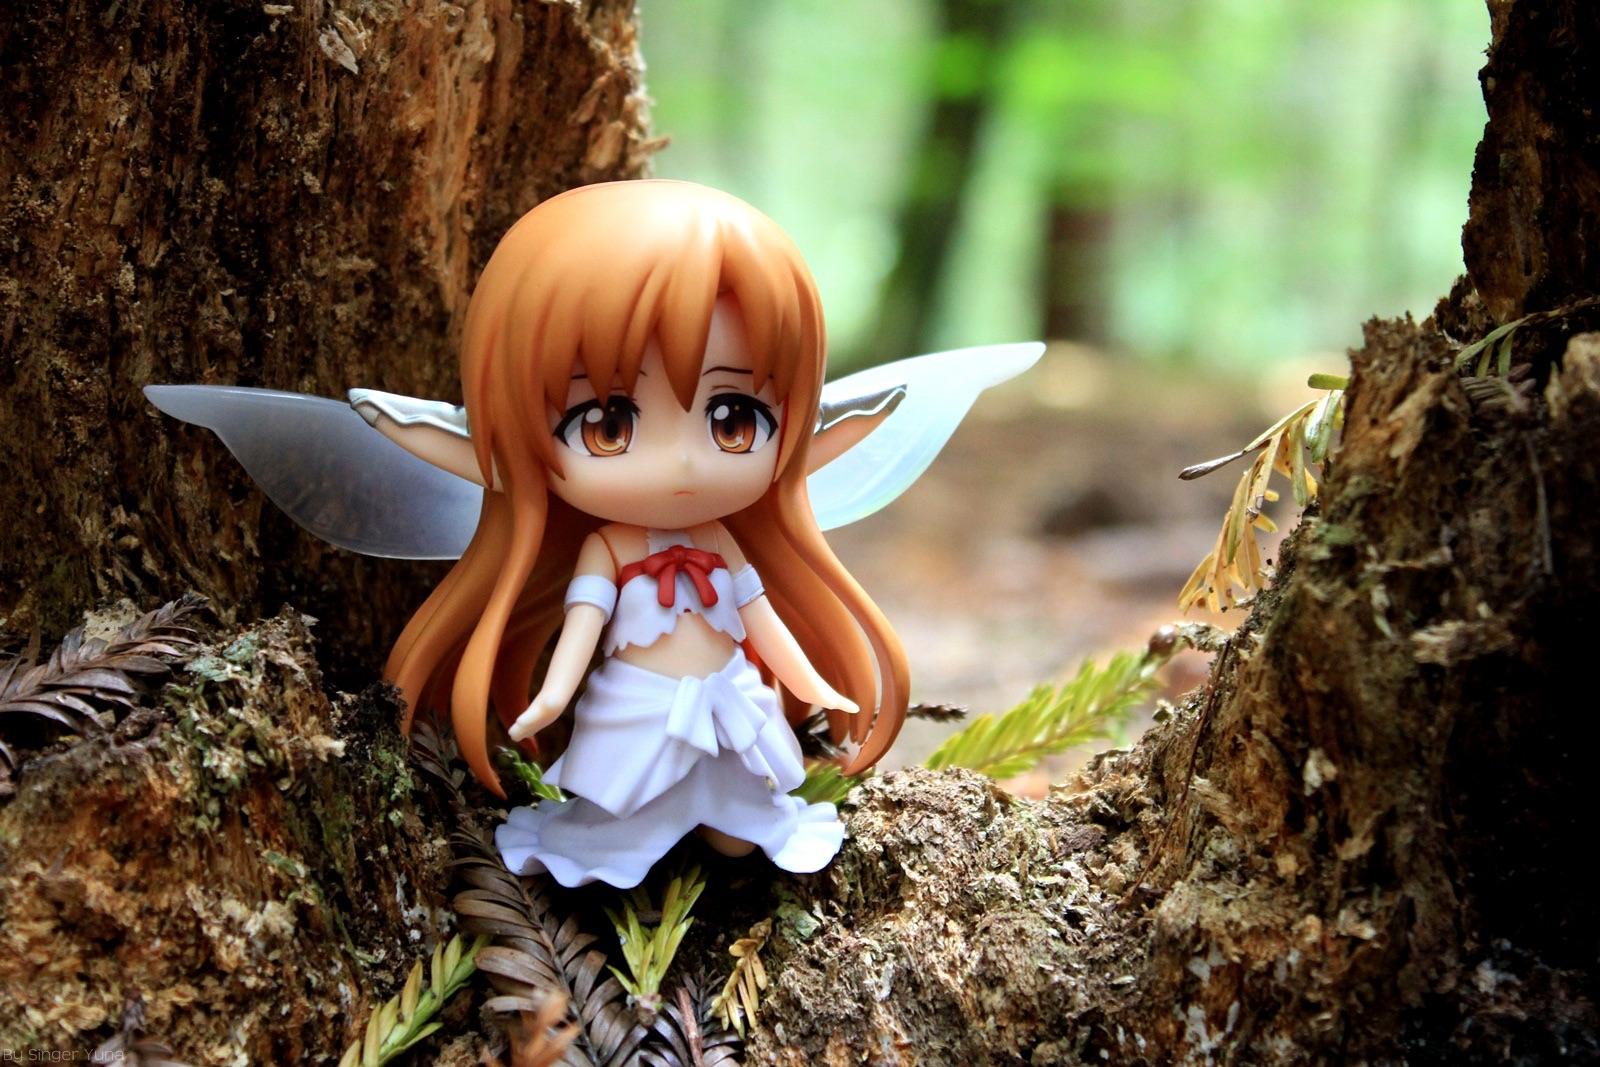 nendoroid good_smile_company asuna ascii_media_works nendoron sword_art_online kawahara_reki shichibee